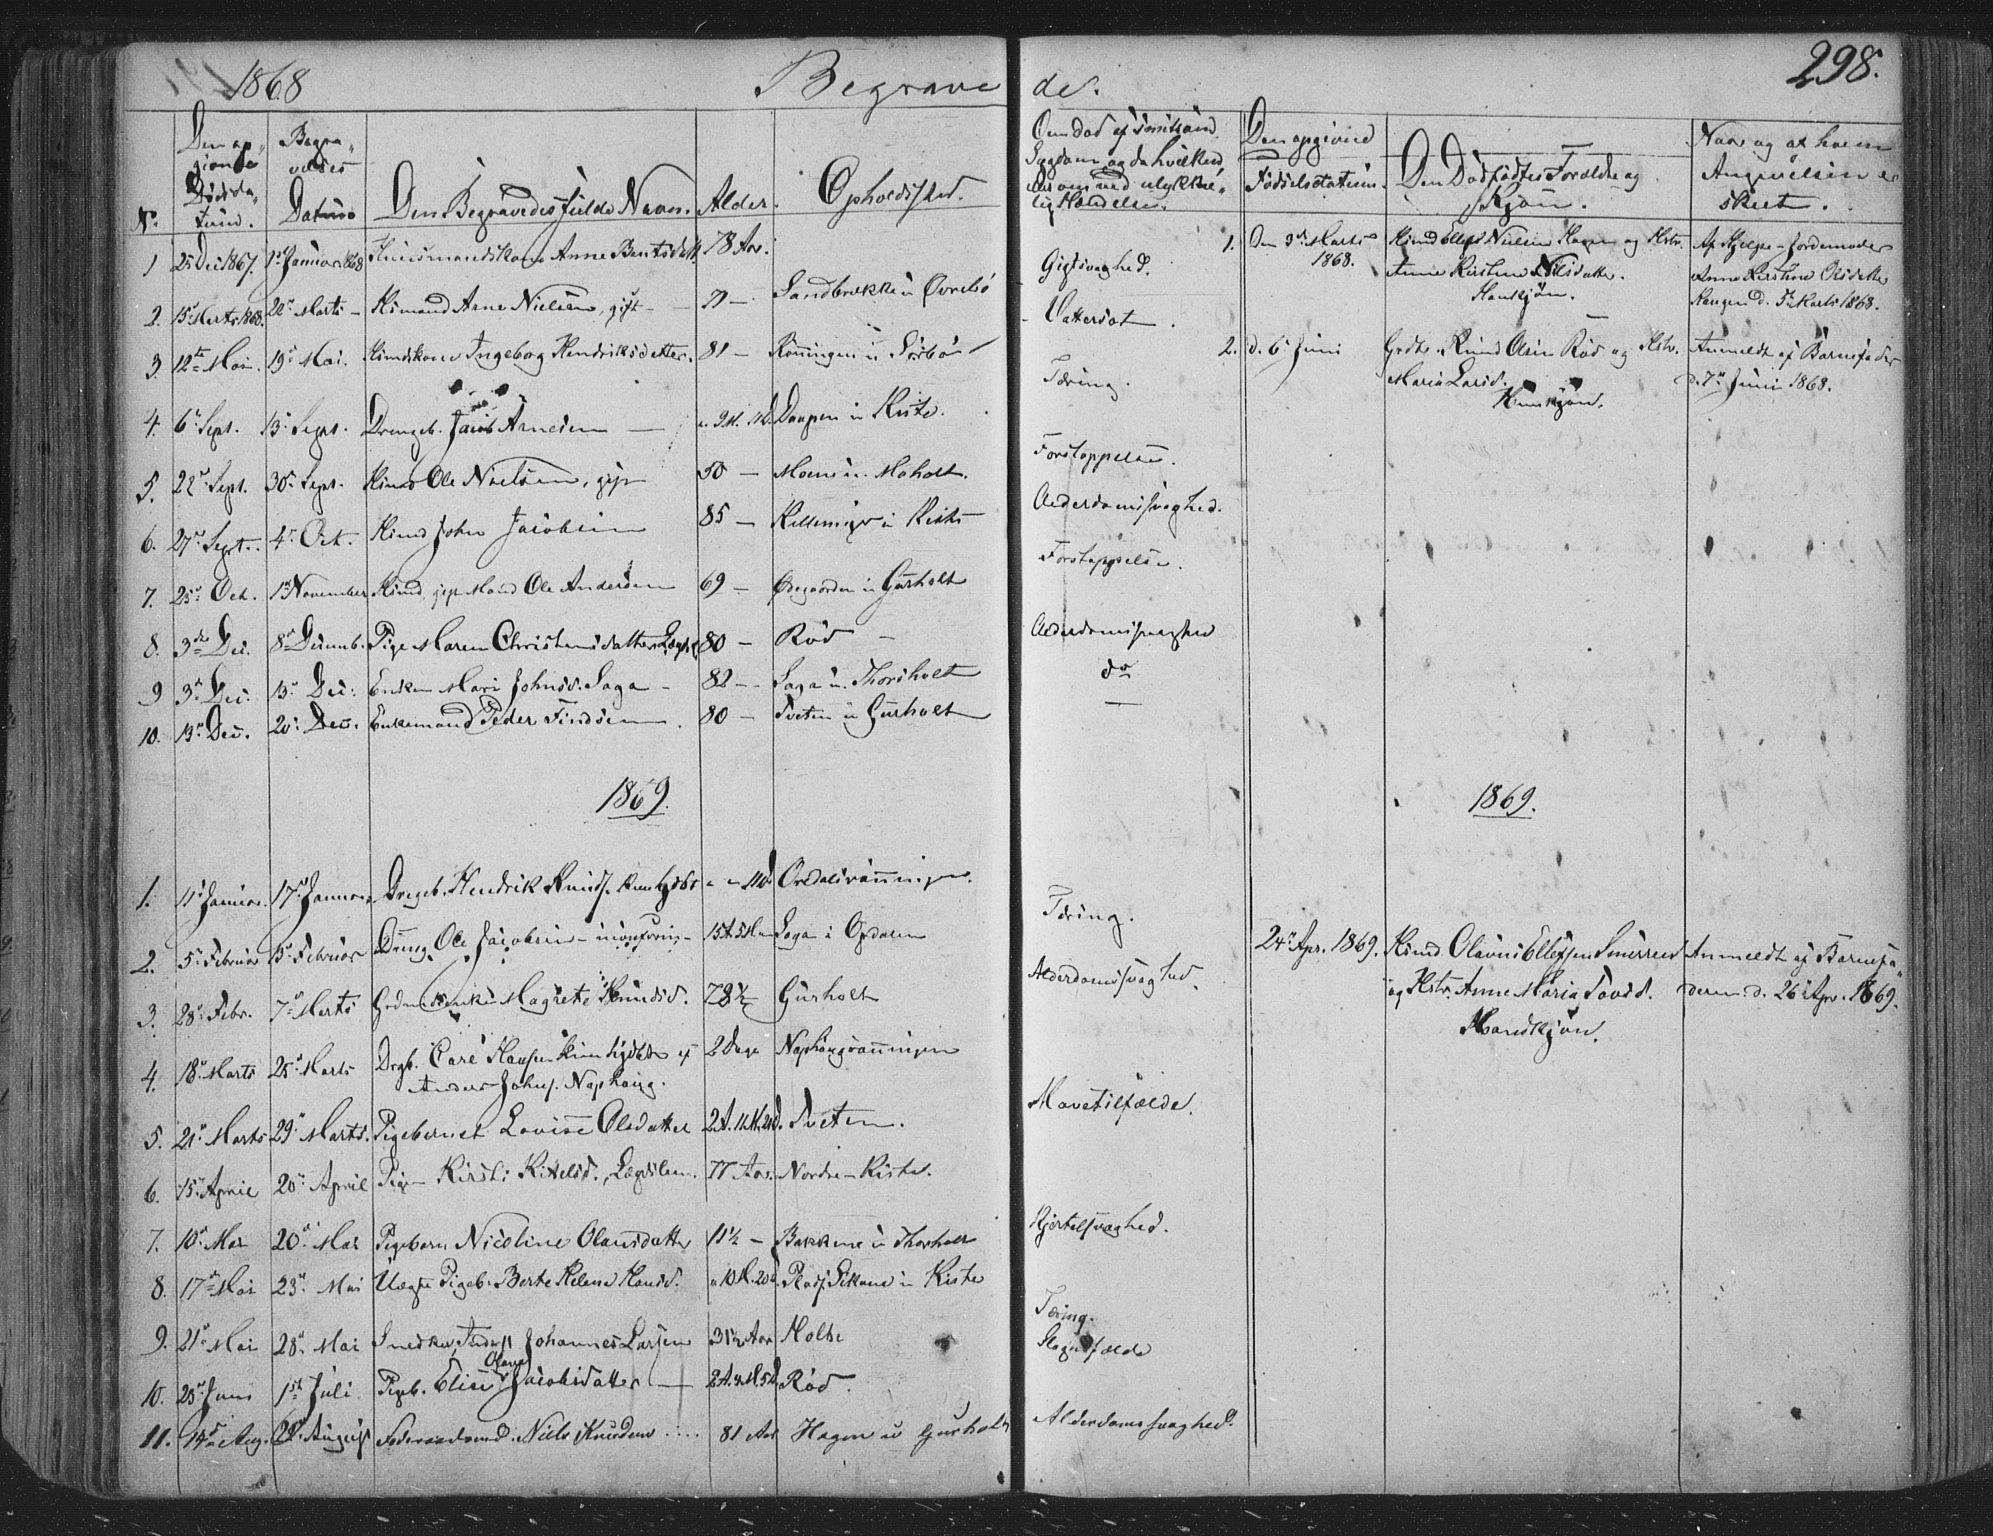 SAKO, Siljan kirkebøker, F/Fa/L0001: Parish register (official) no. 1, 1831-1870, p. 298